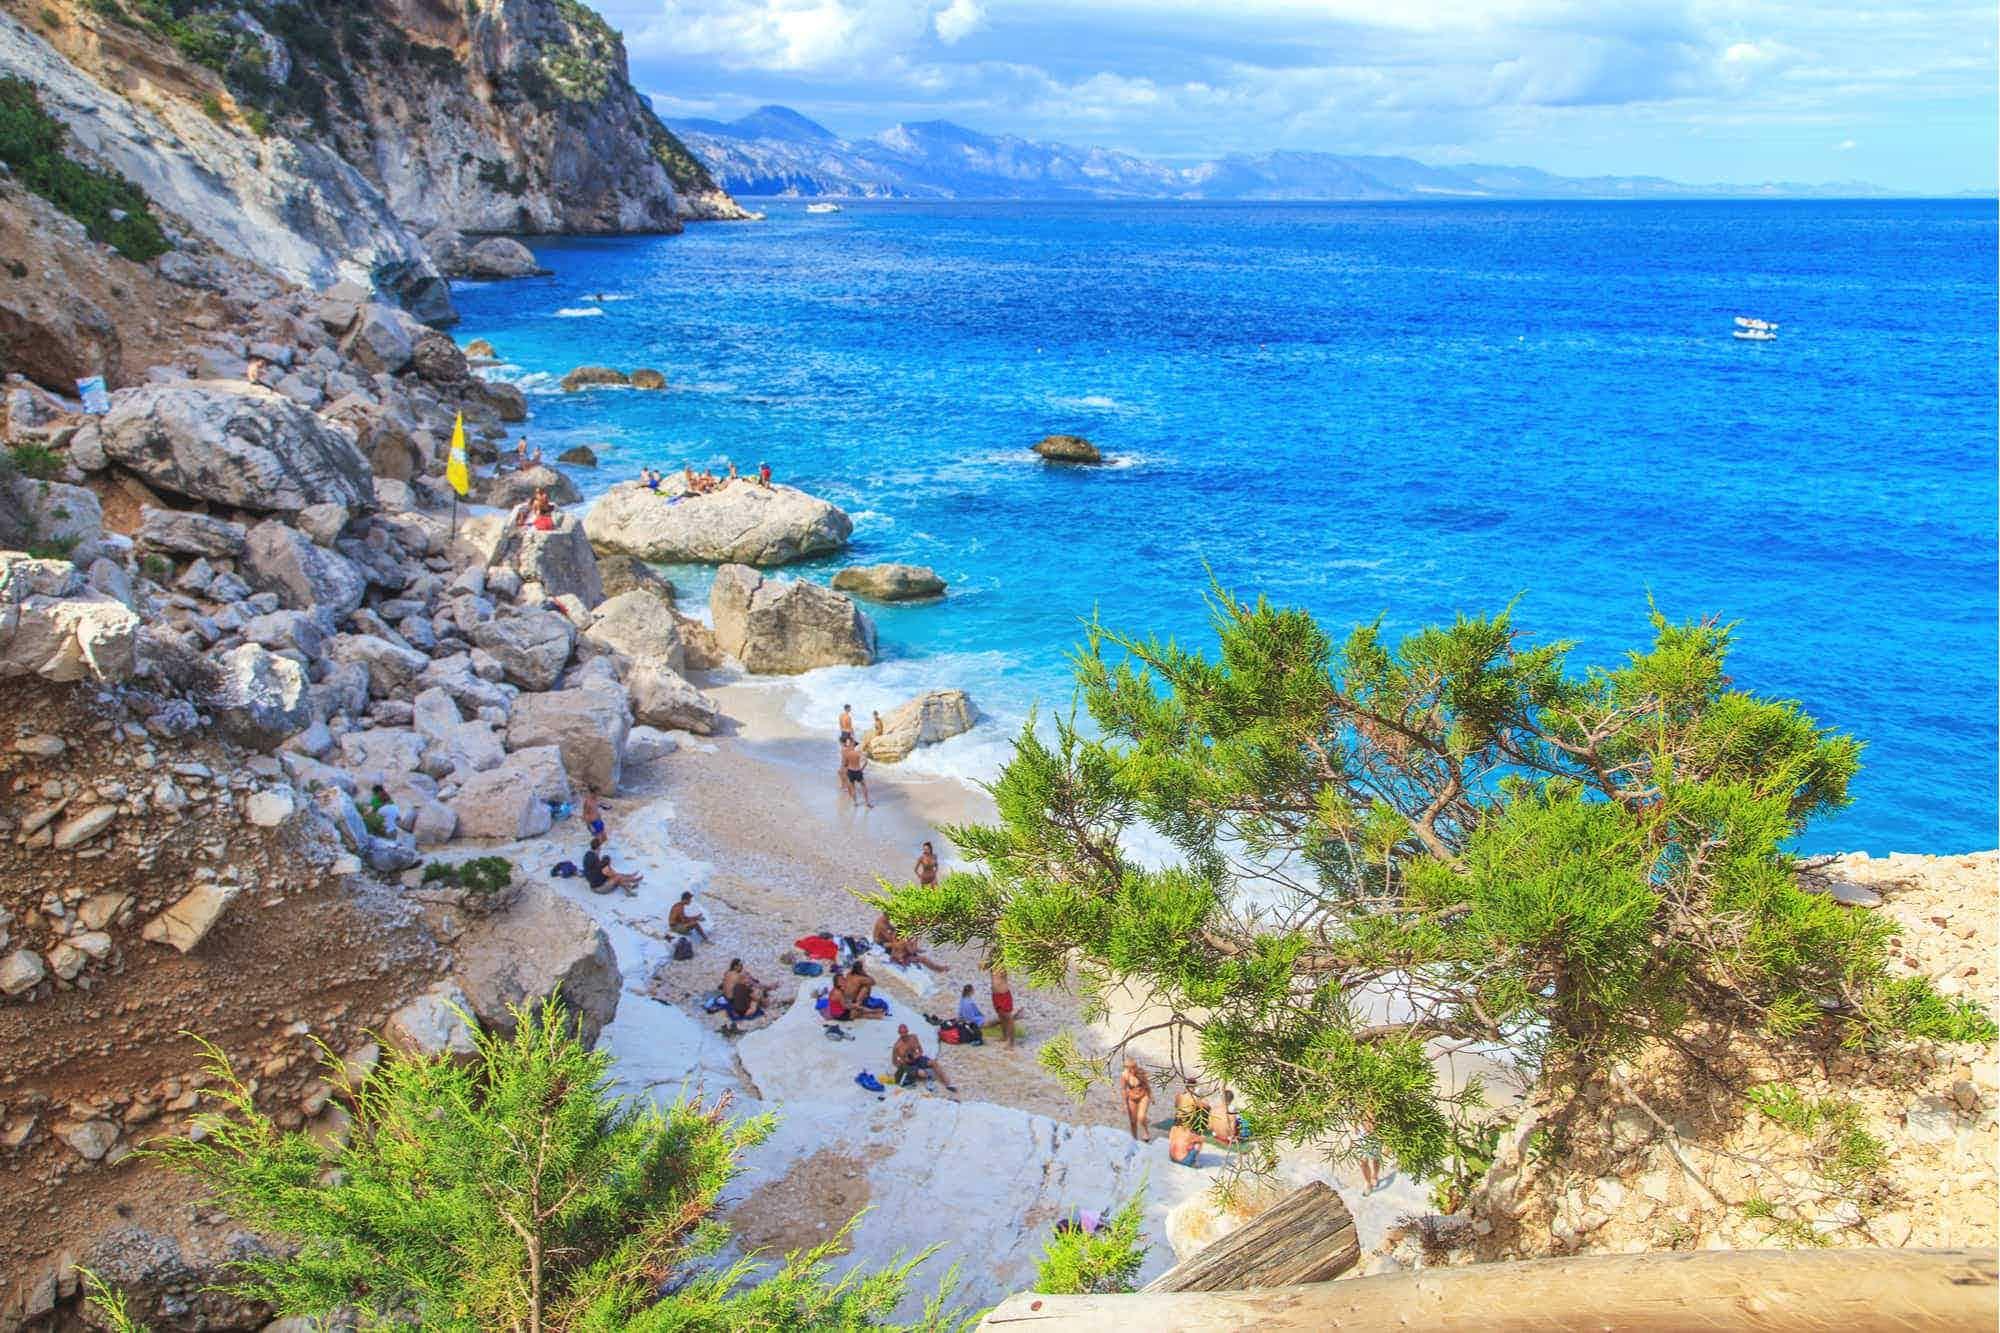 La playa Cala Goloritzè en Olbia